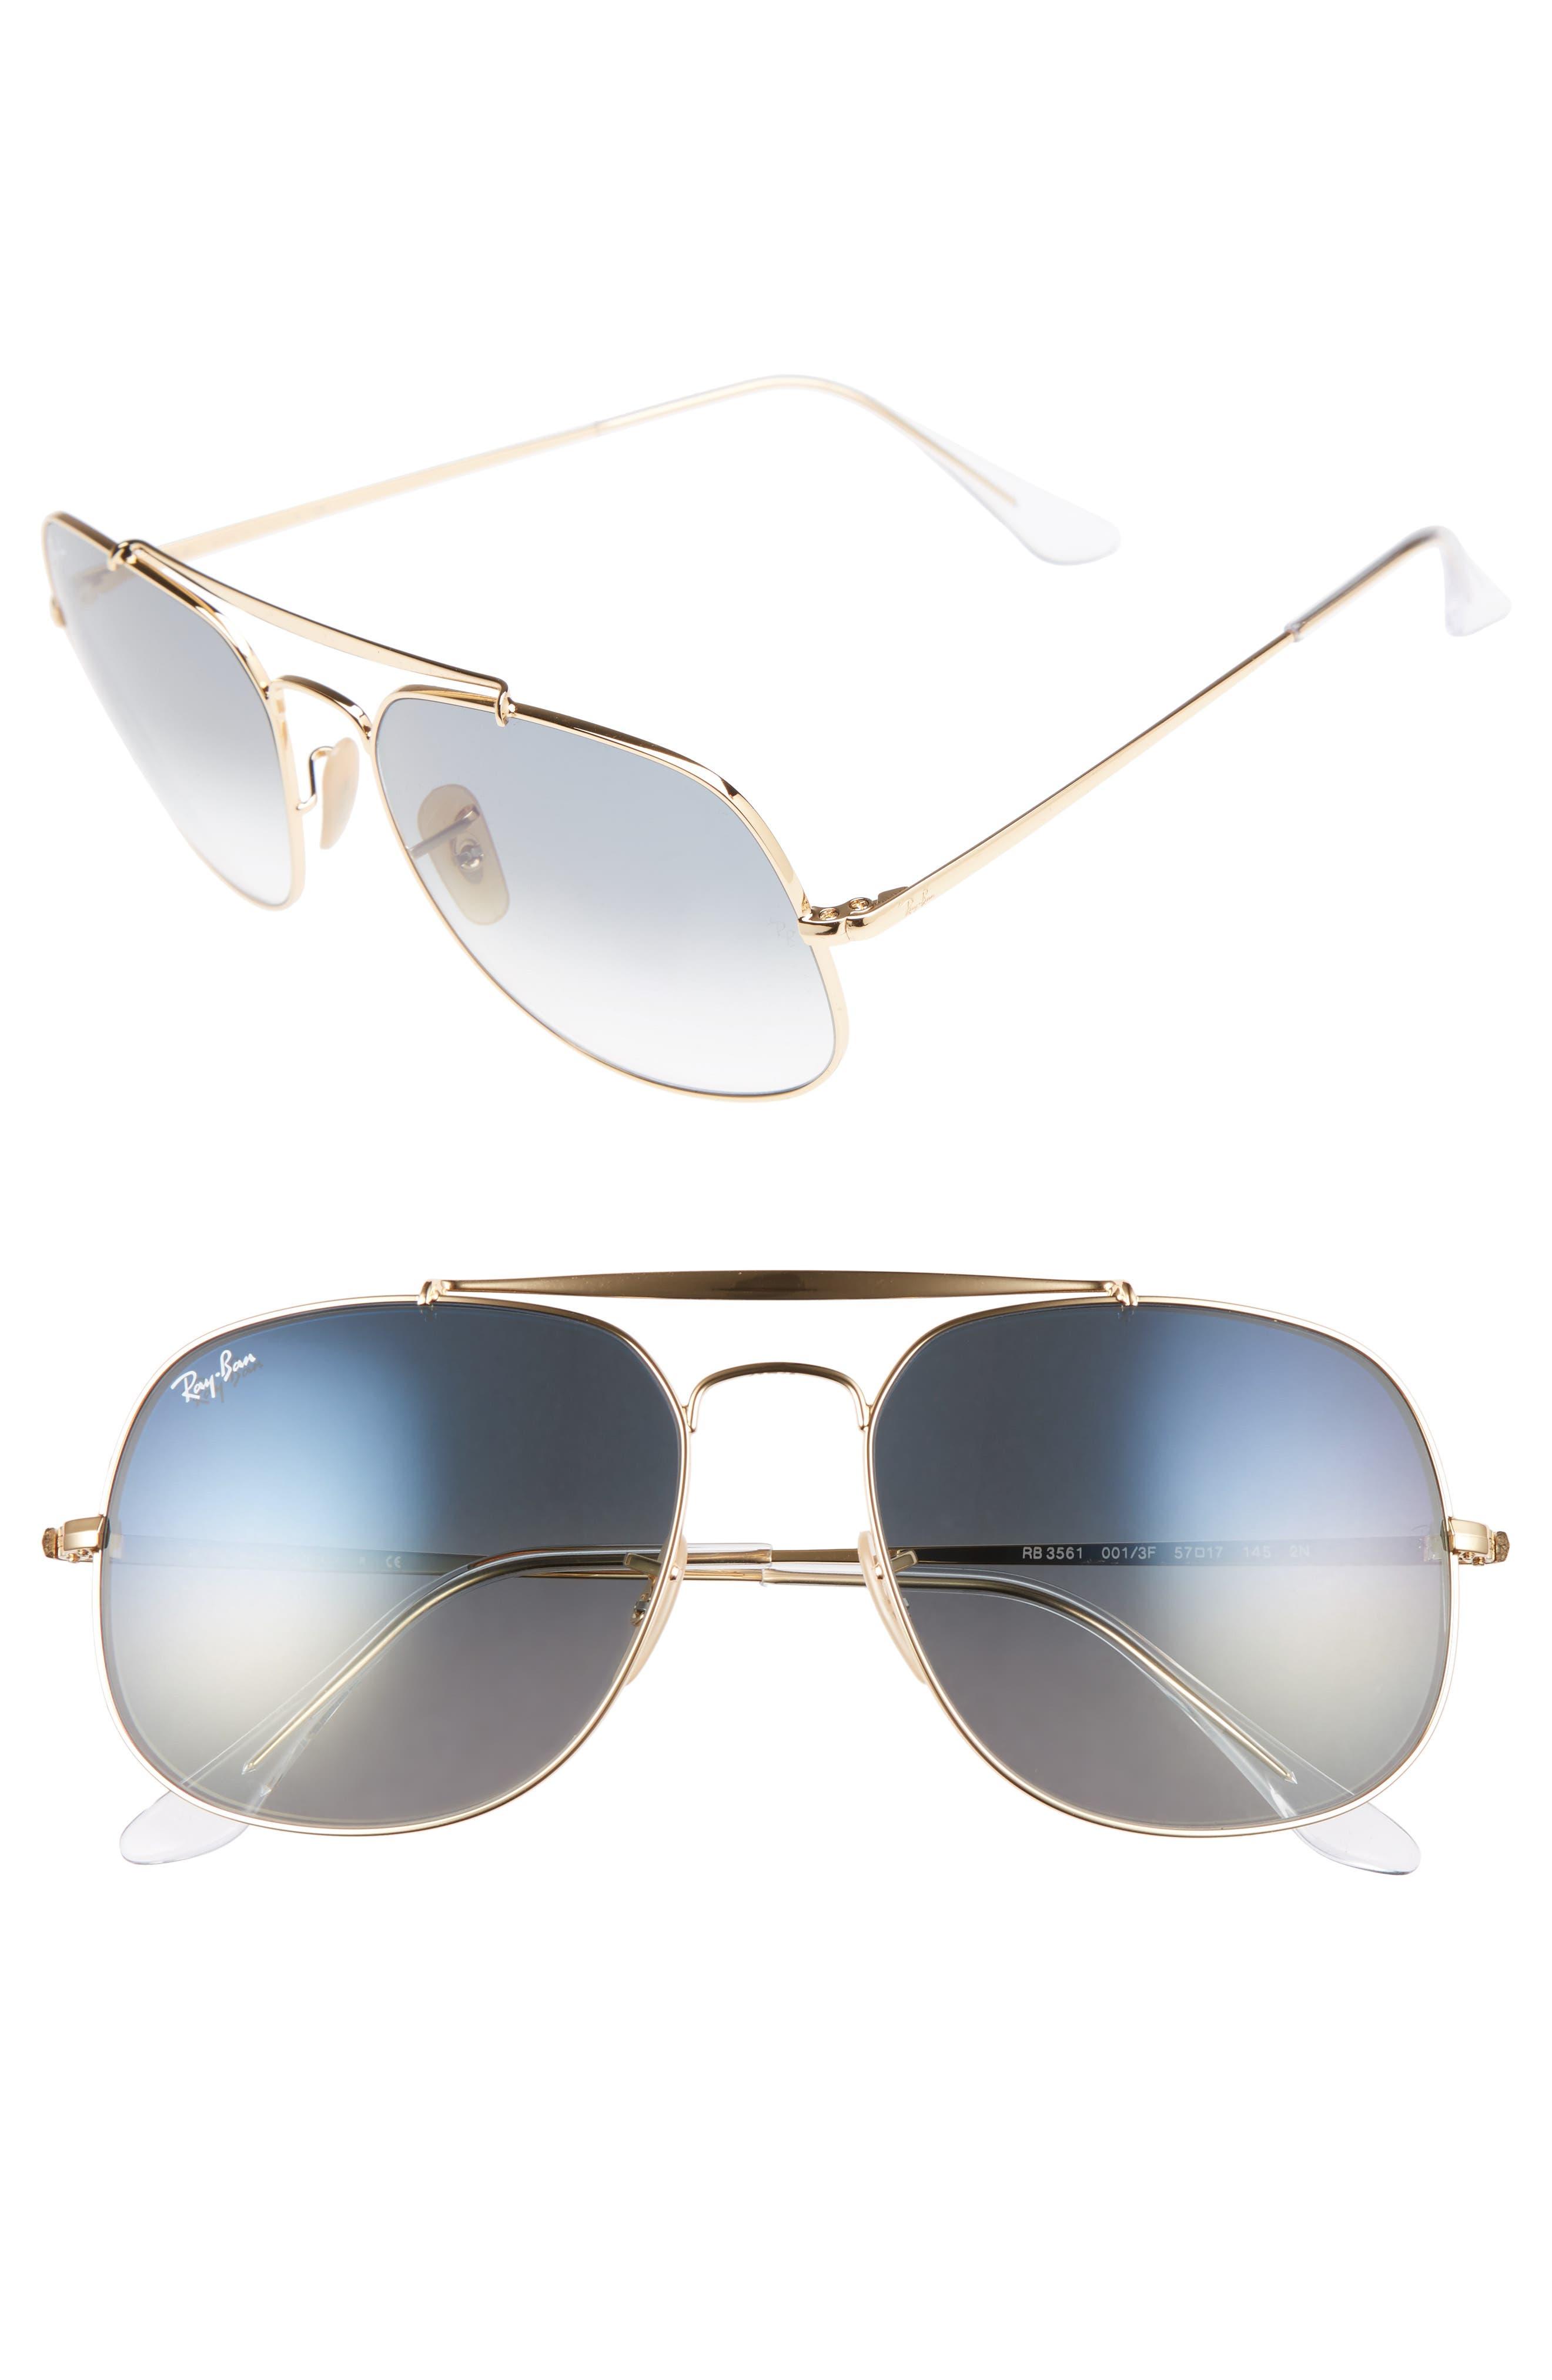 57mm Gradient Lens Square Aviator Sunglasses,                             Main thumbnail 2, color,